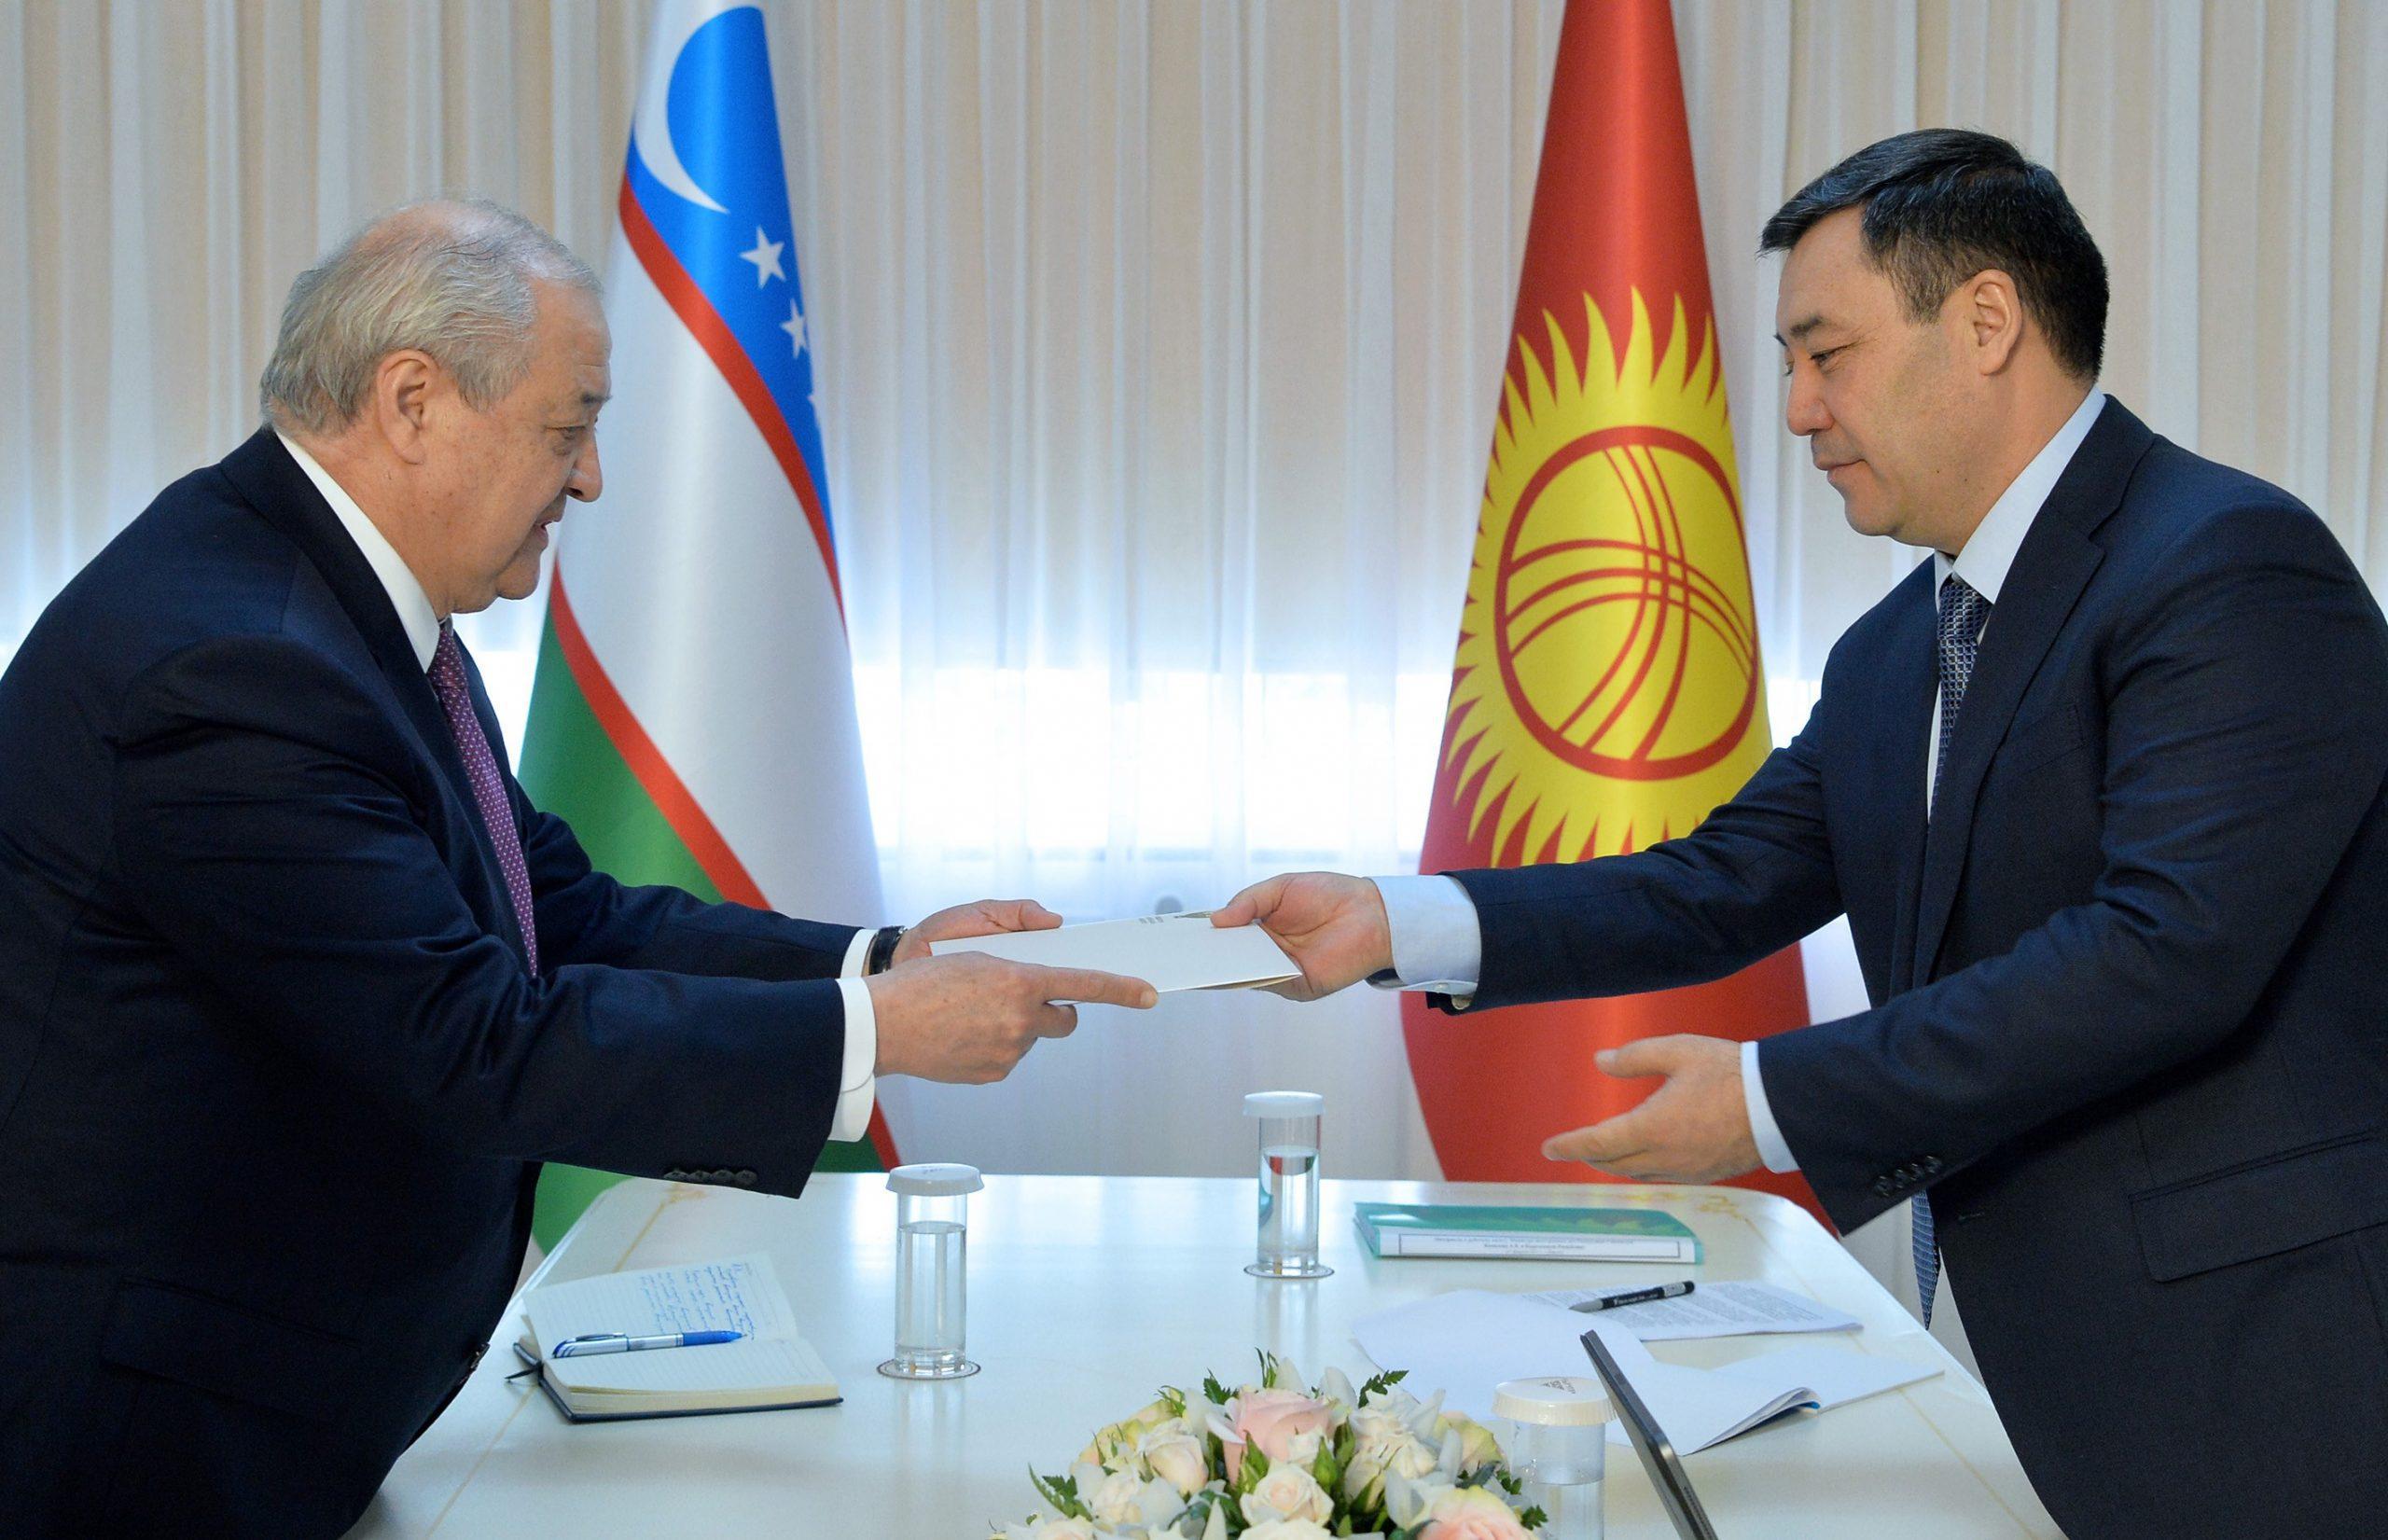 Абдулазиз Камилов встретился с президентом Кыргызстана